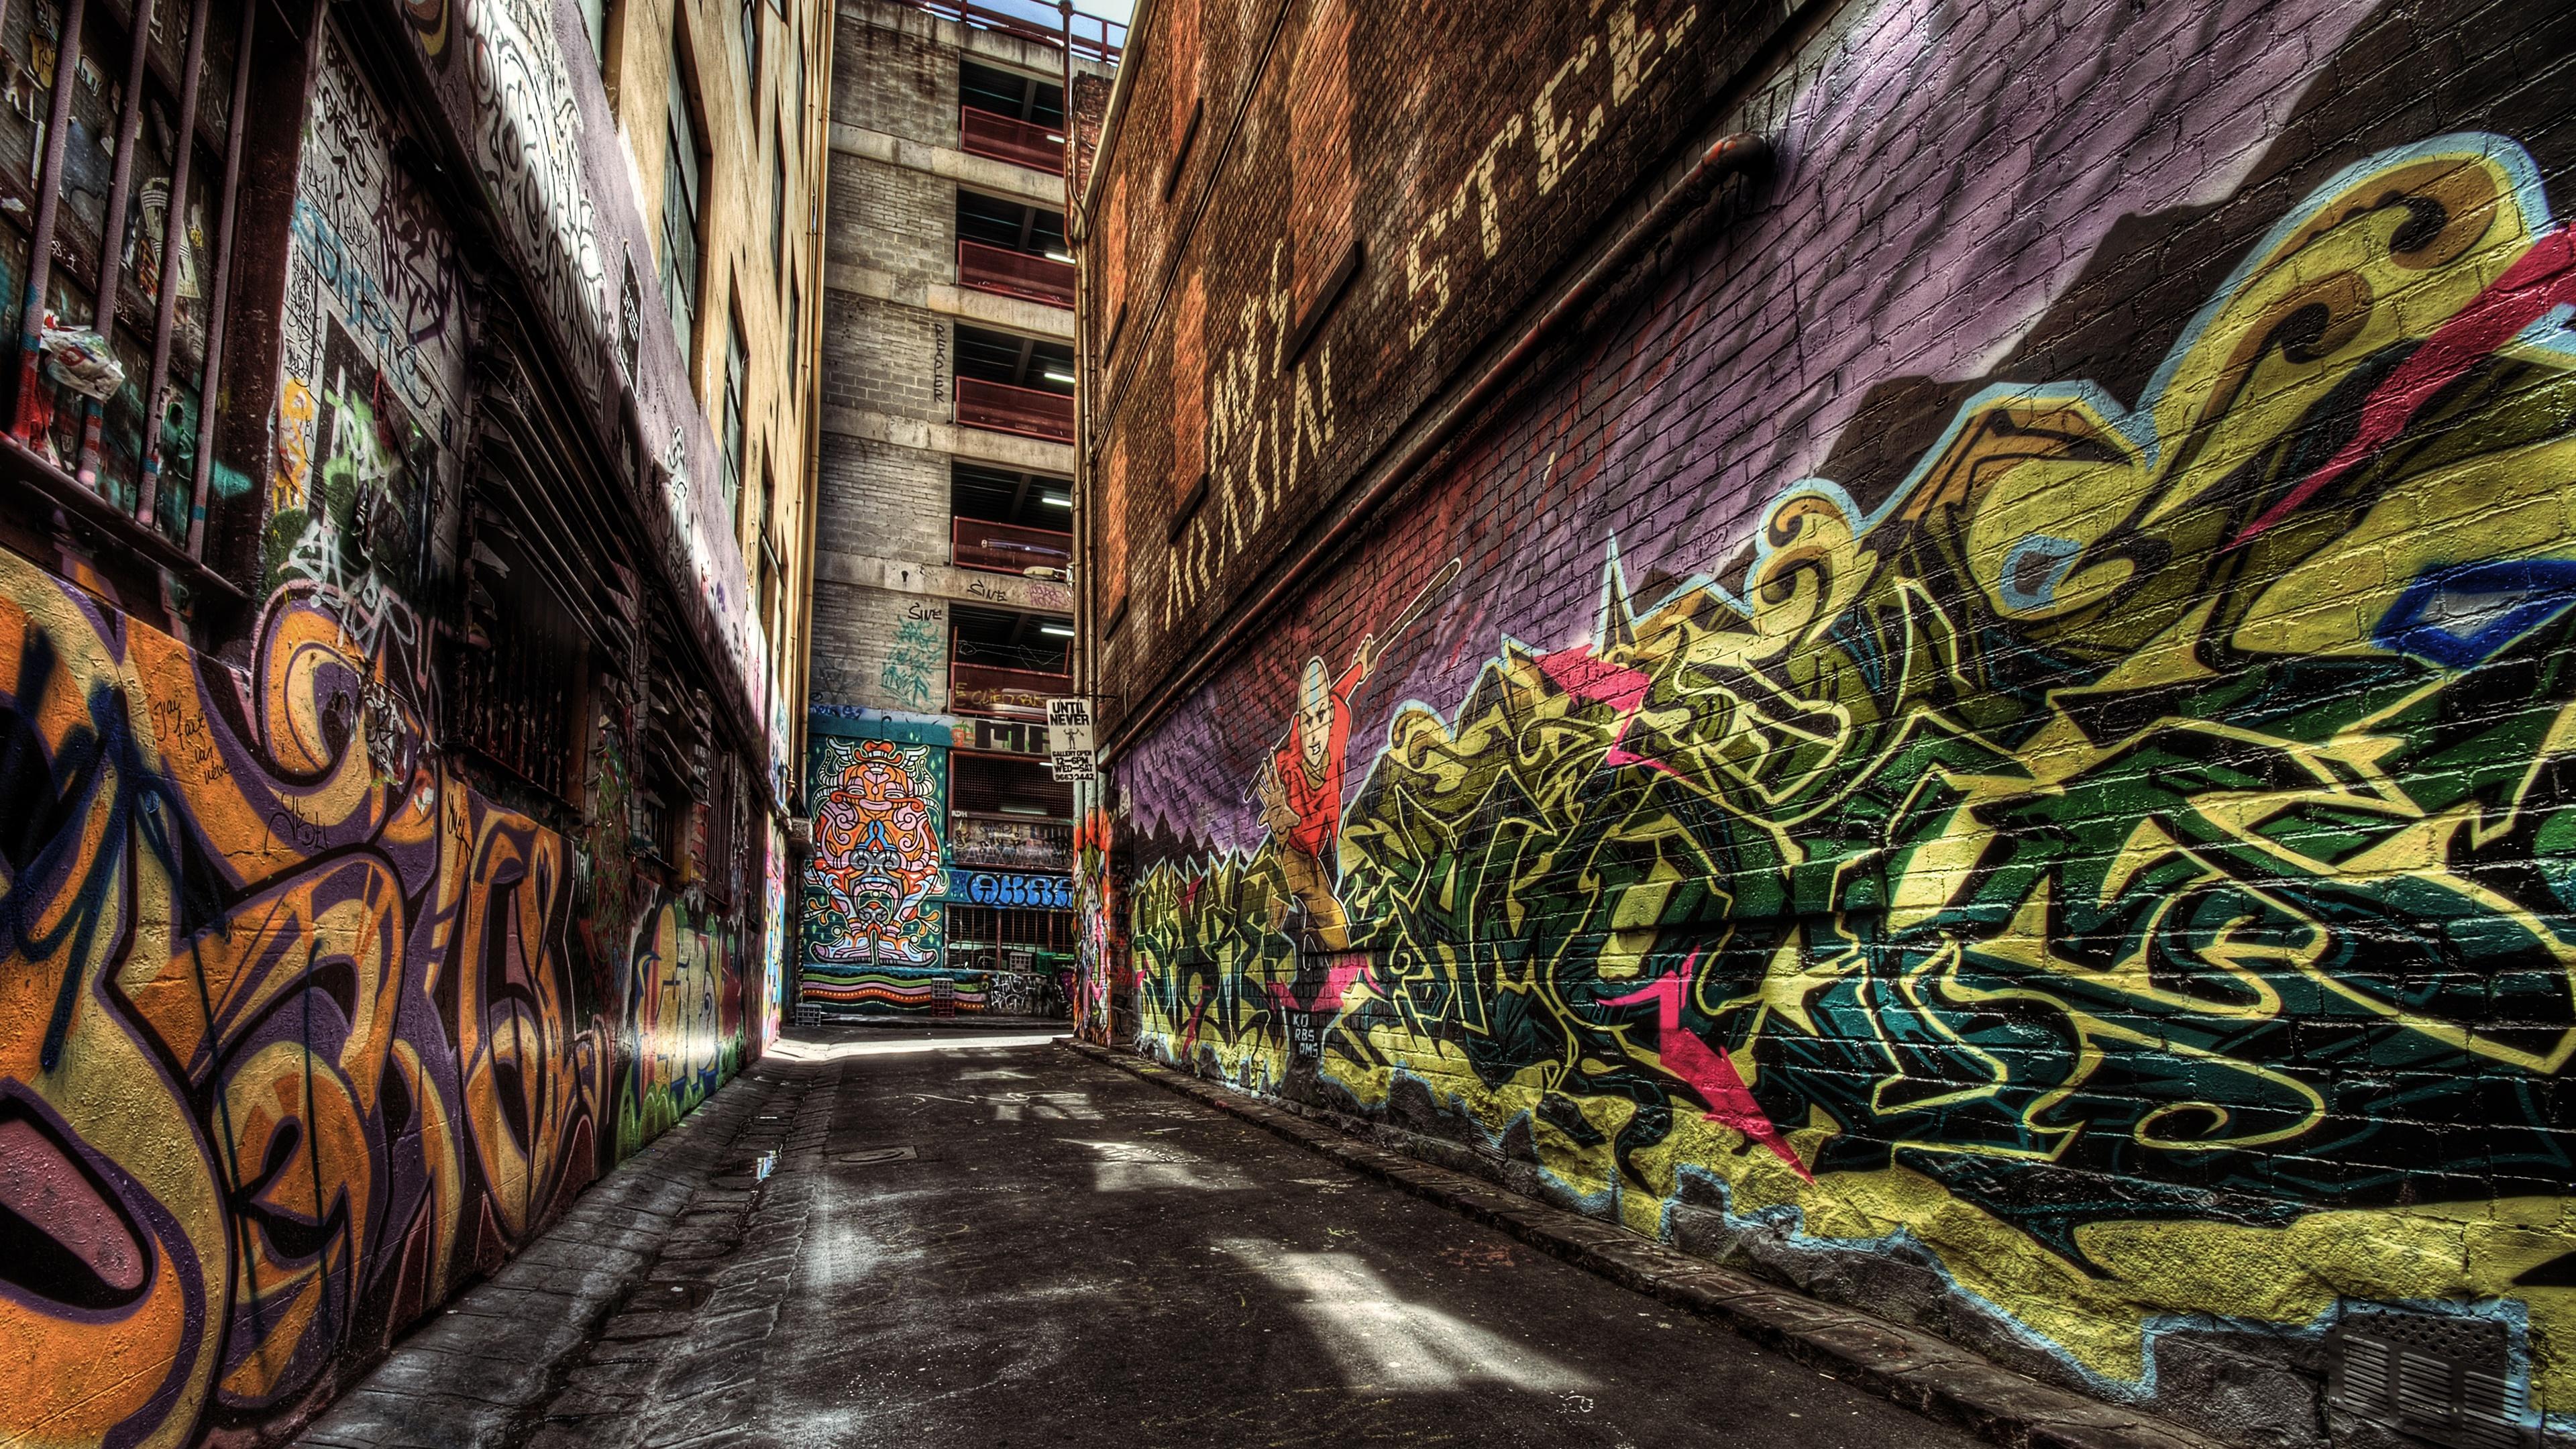 Alley Way Graffiti 4K UltraHD Wallpaper - backiee